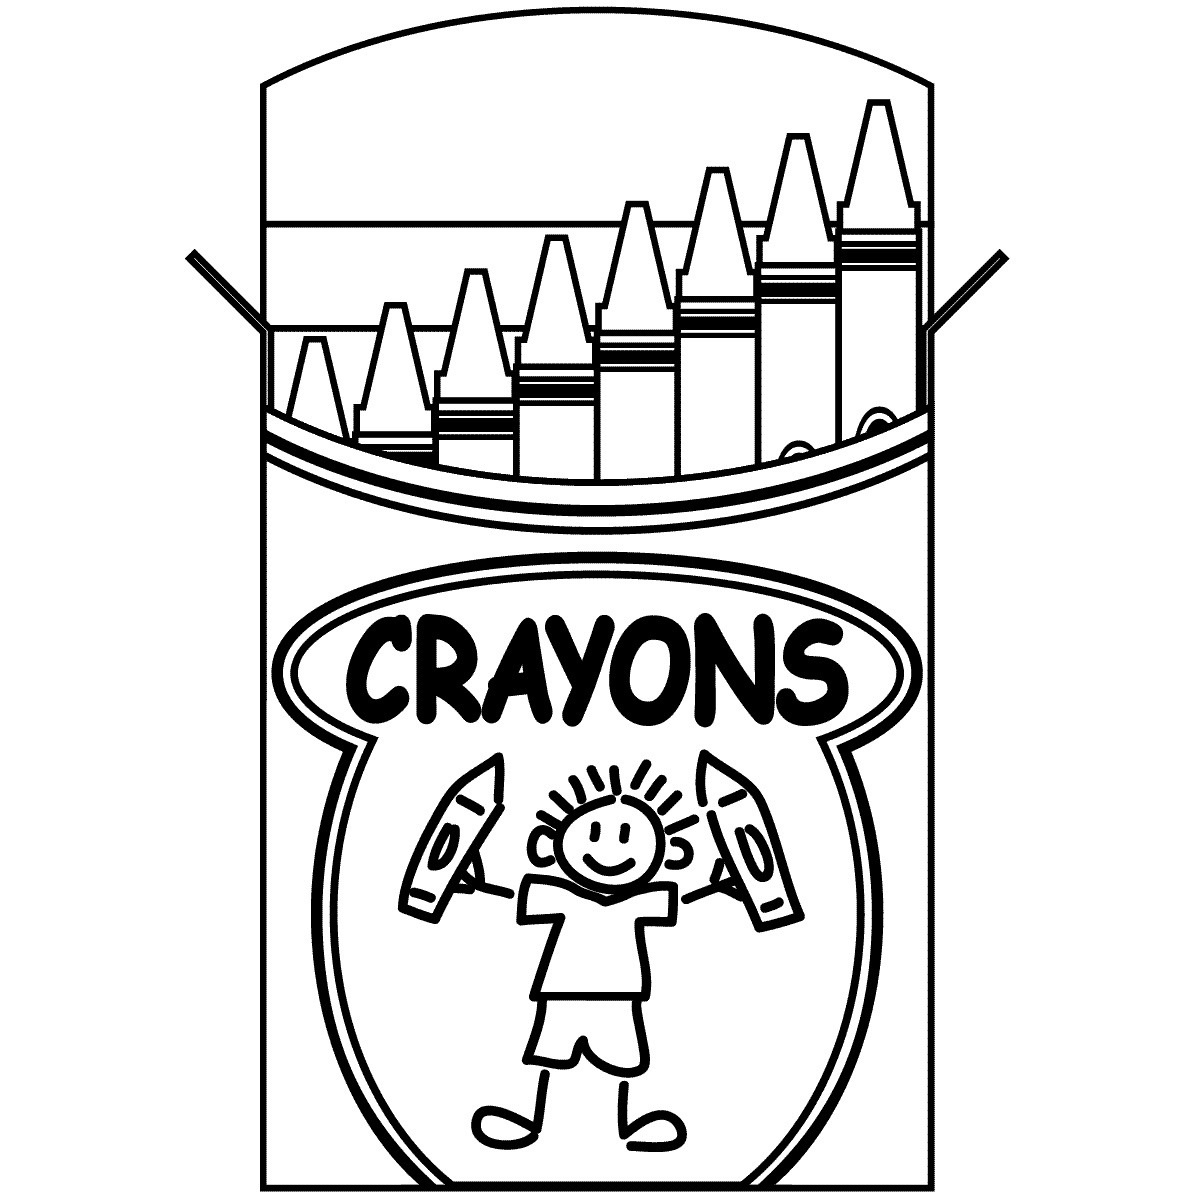 Colored pencil black and white clipart clip art library download Colored Pencils Clipart Black And White | Letters Format within ... clip art library download